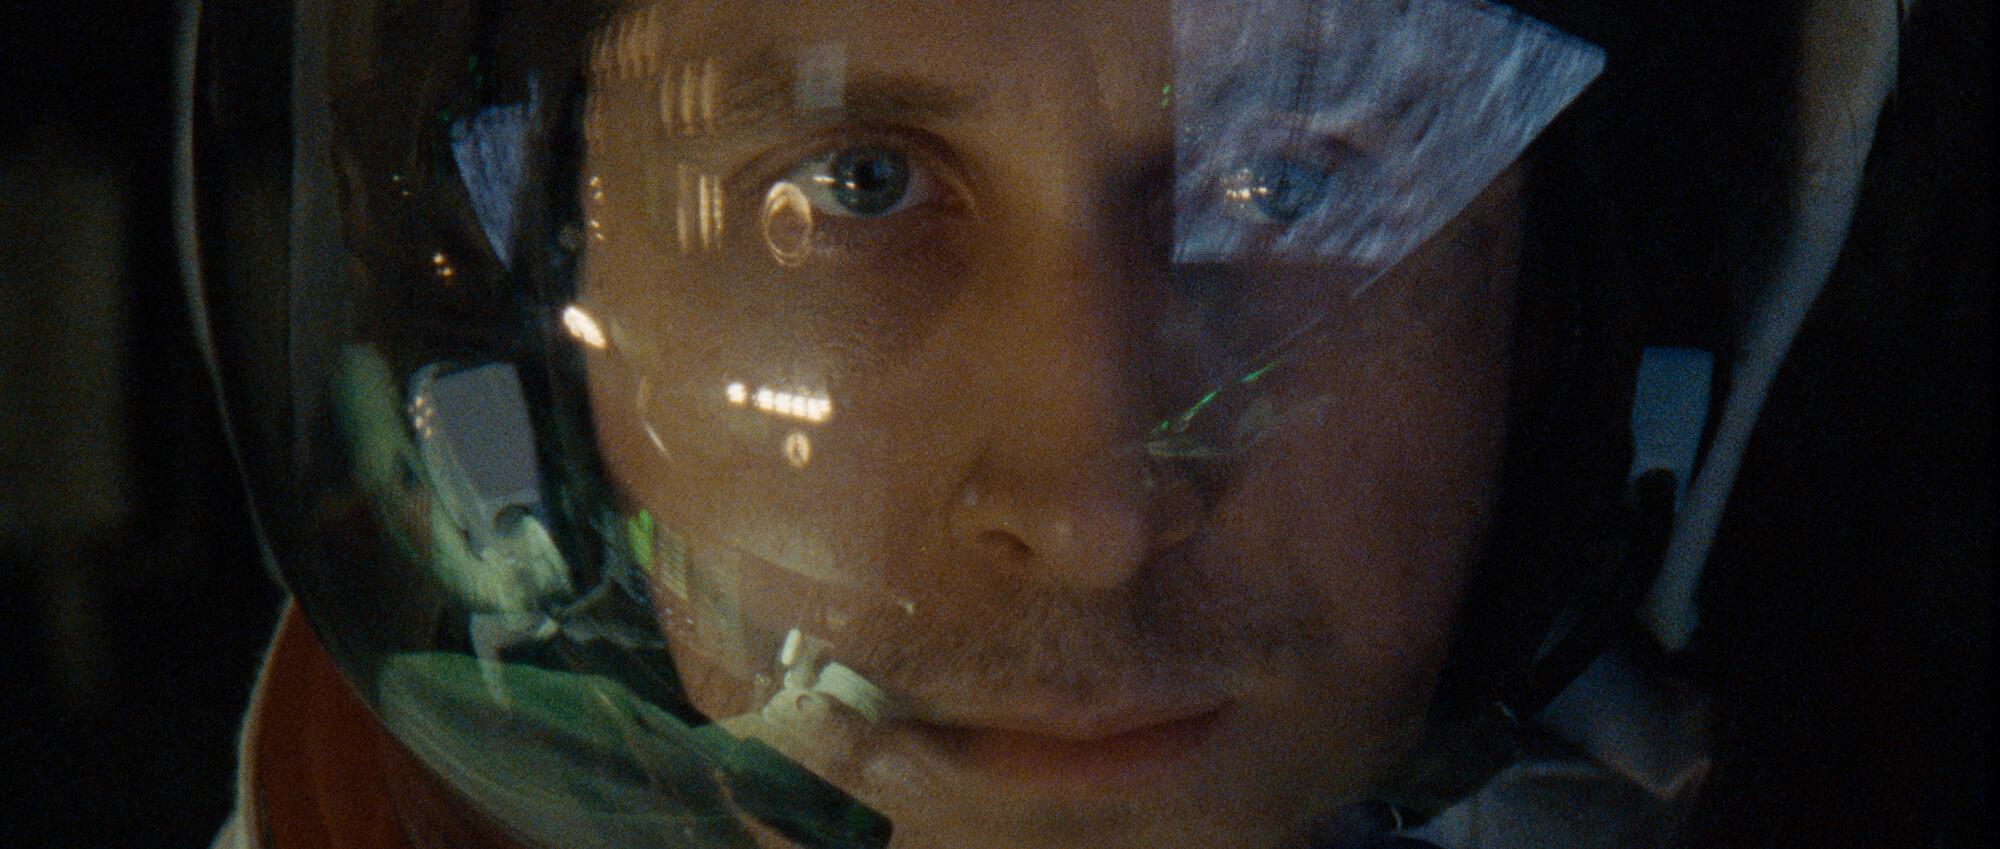 Ryan Gosling | Universal Pictures